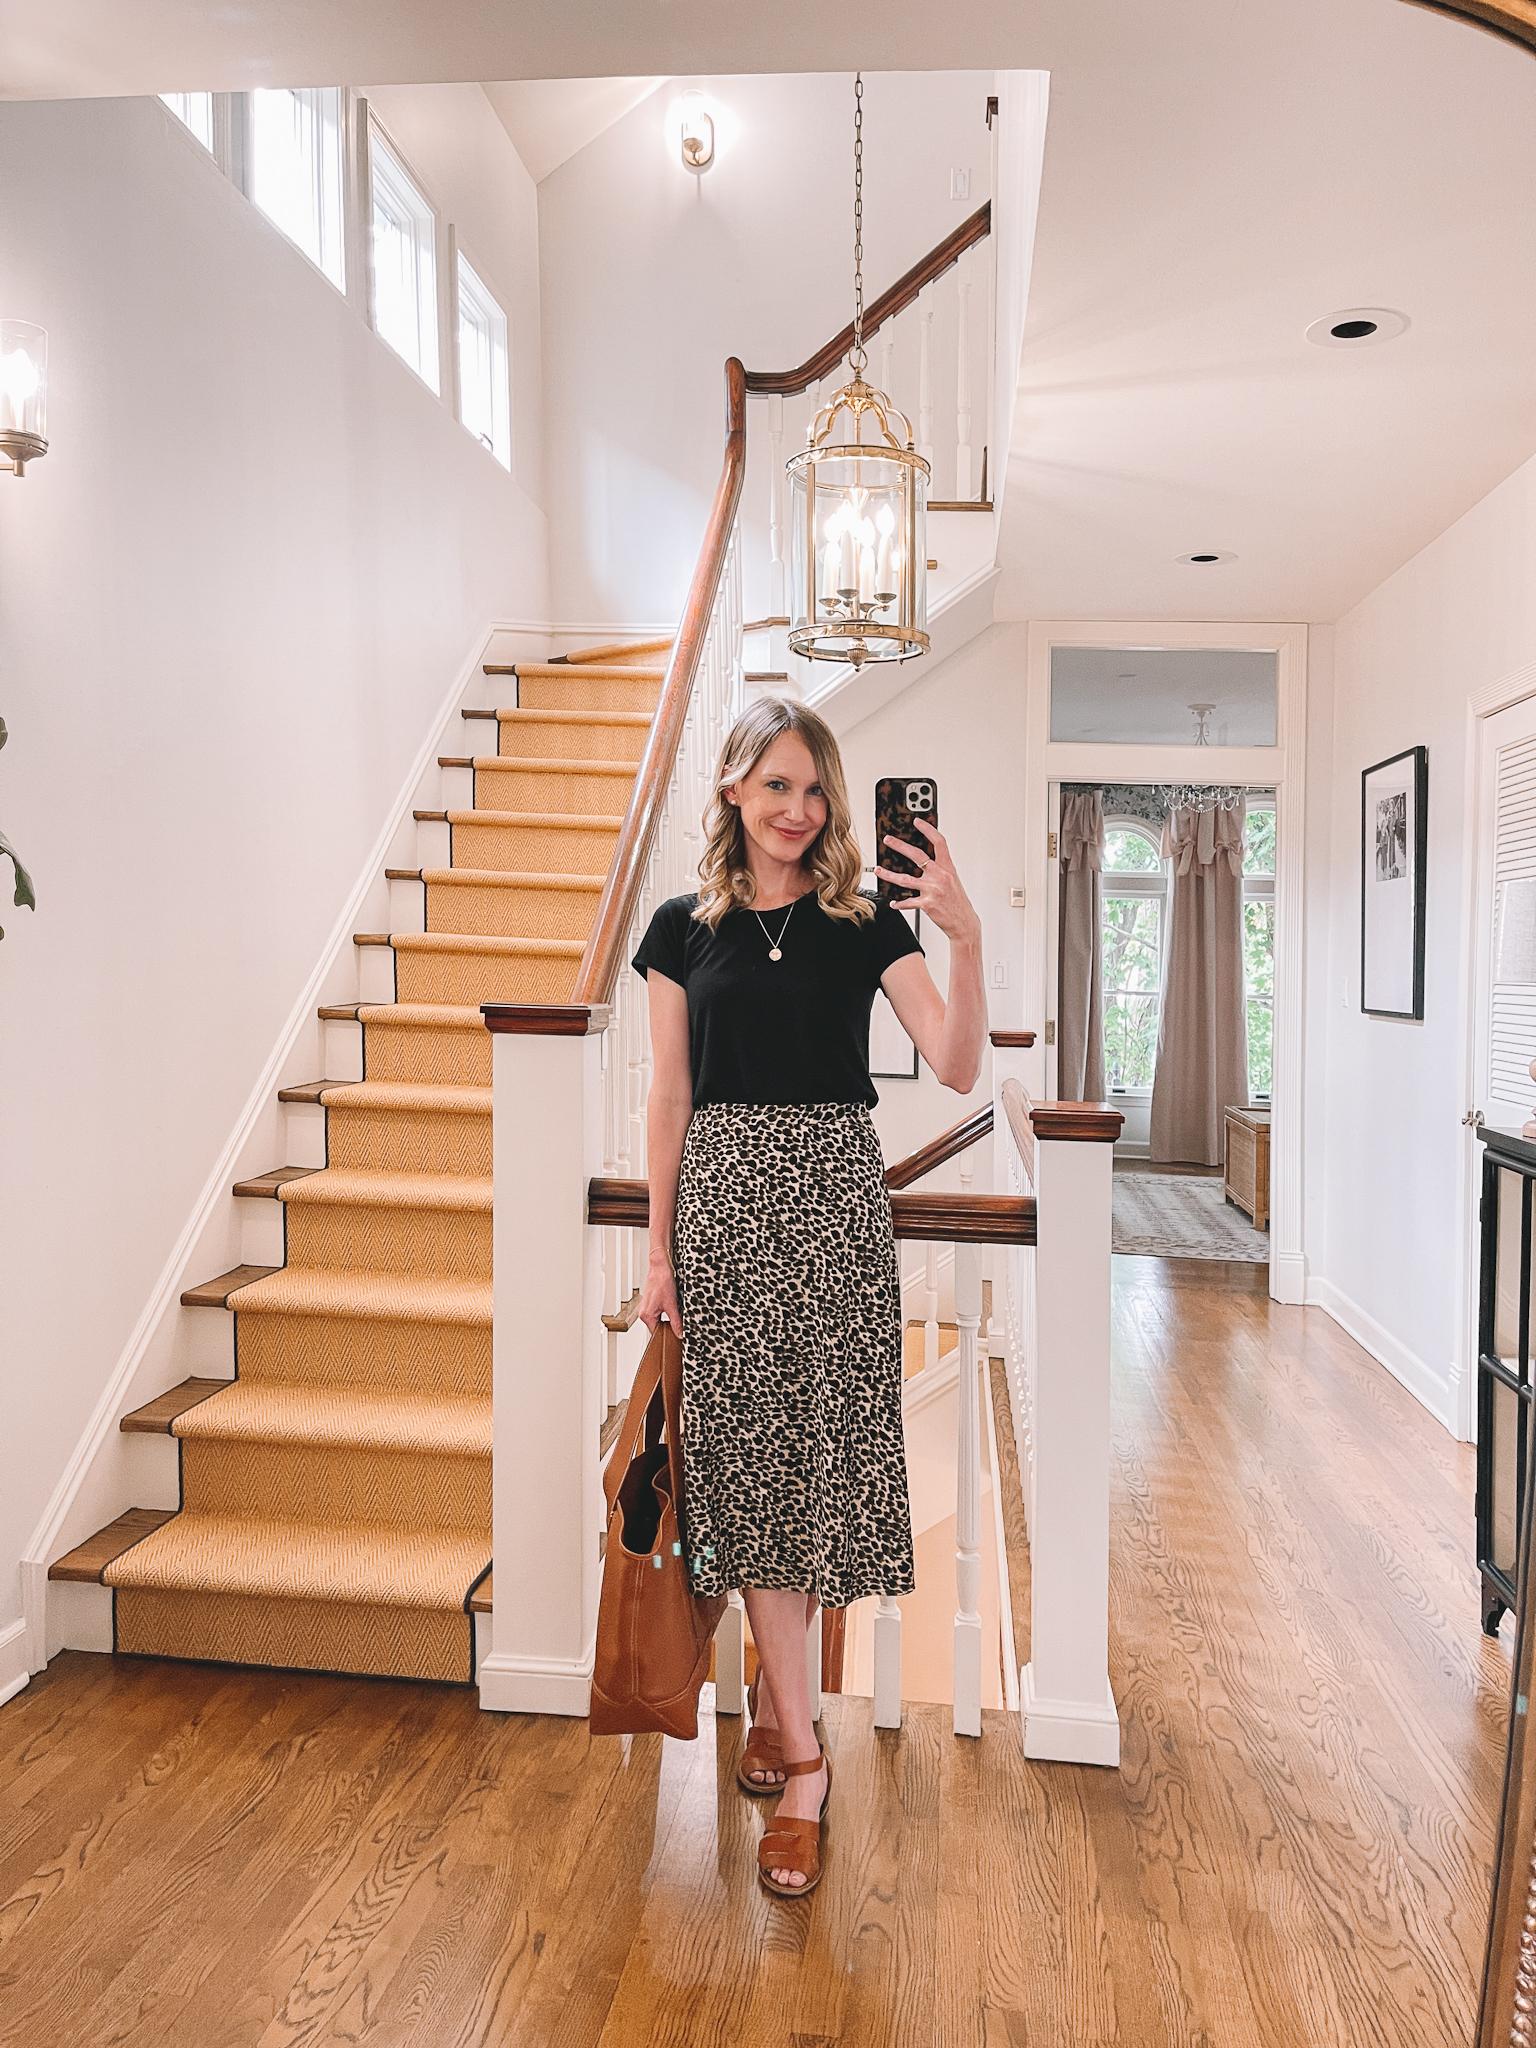 Leopard Slip Skirts   What I Wore 9/24